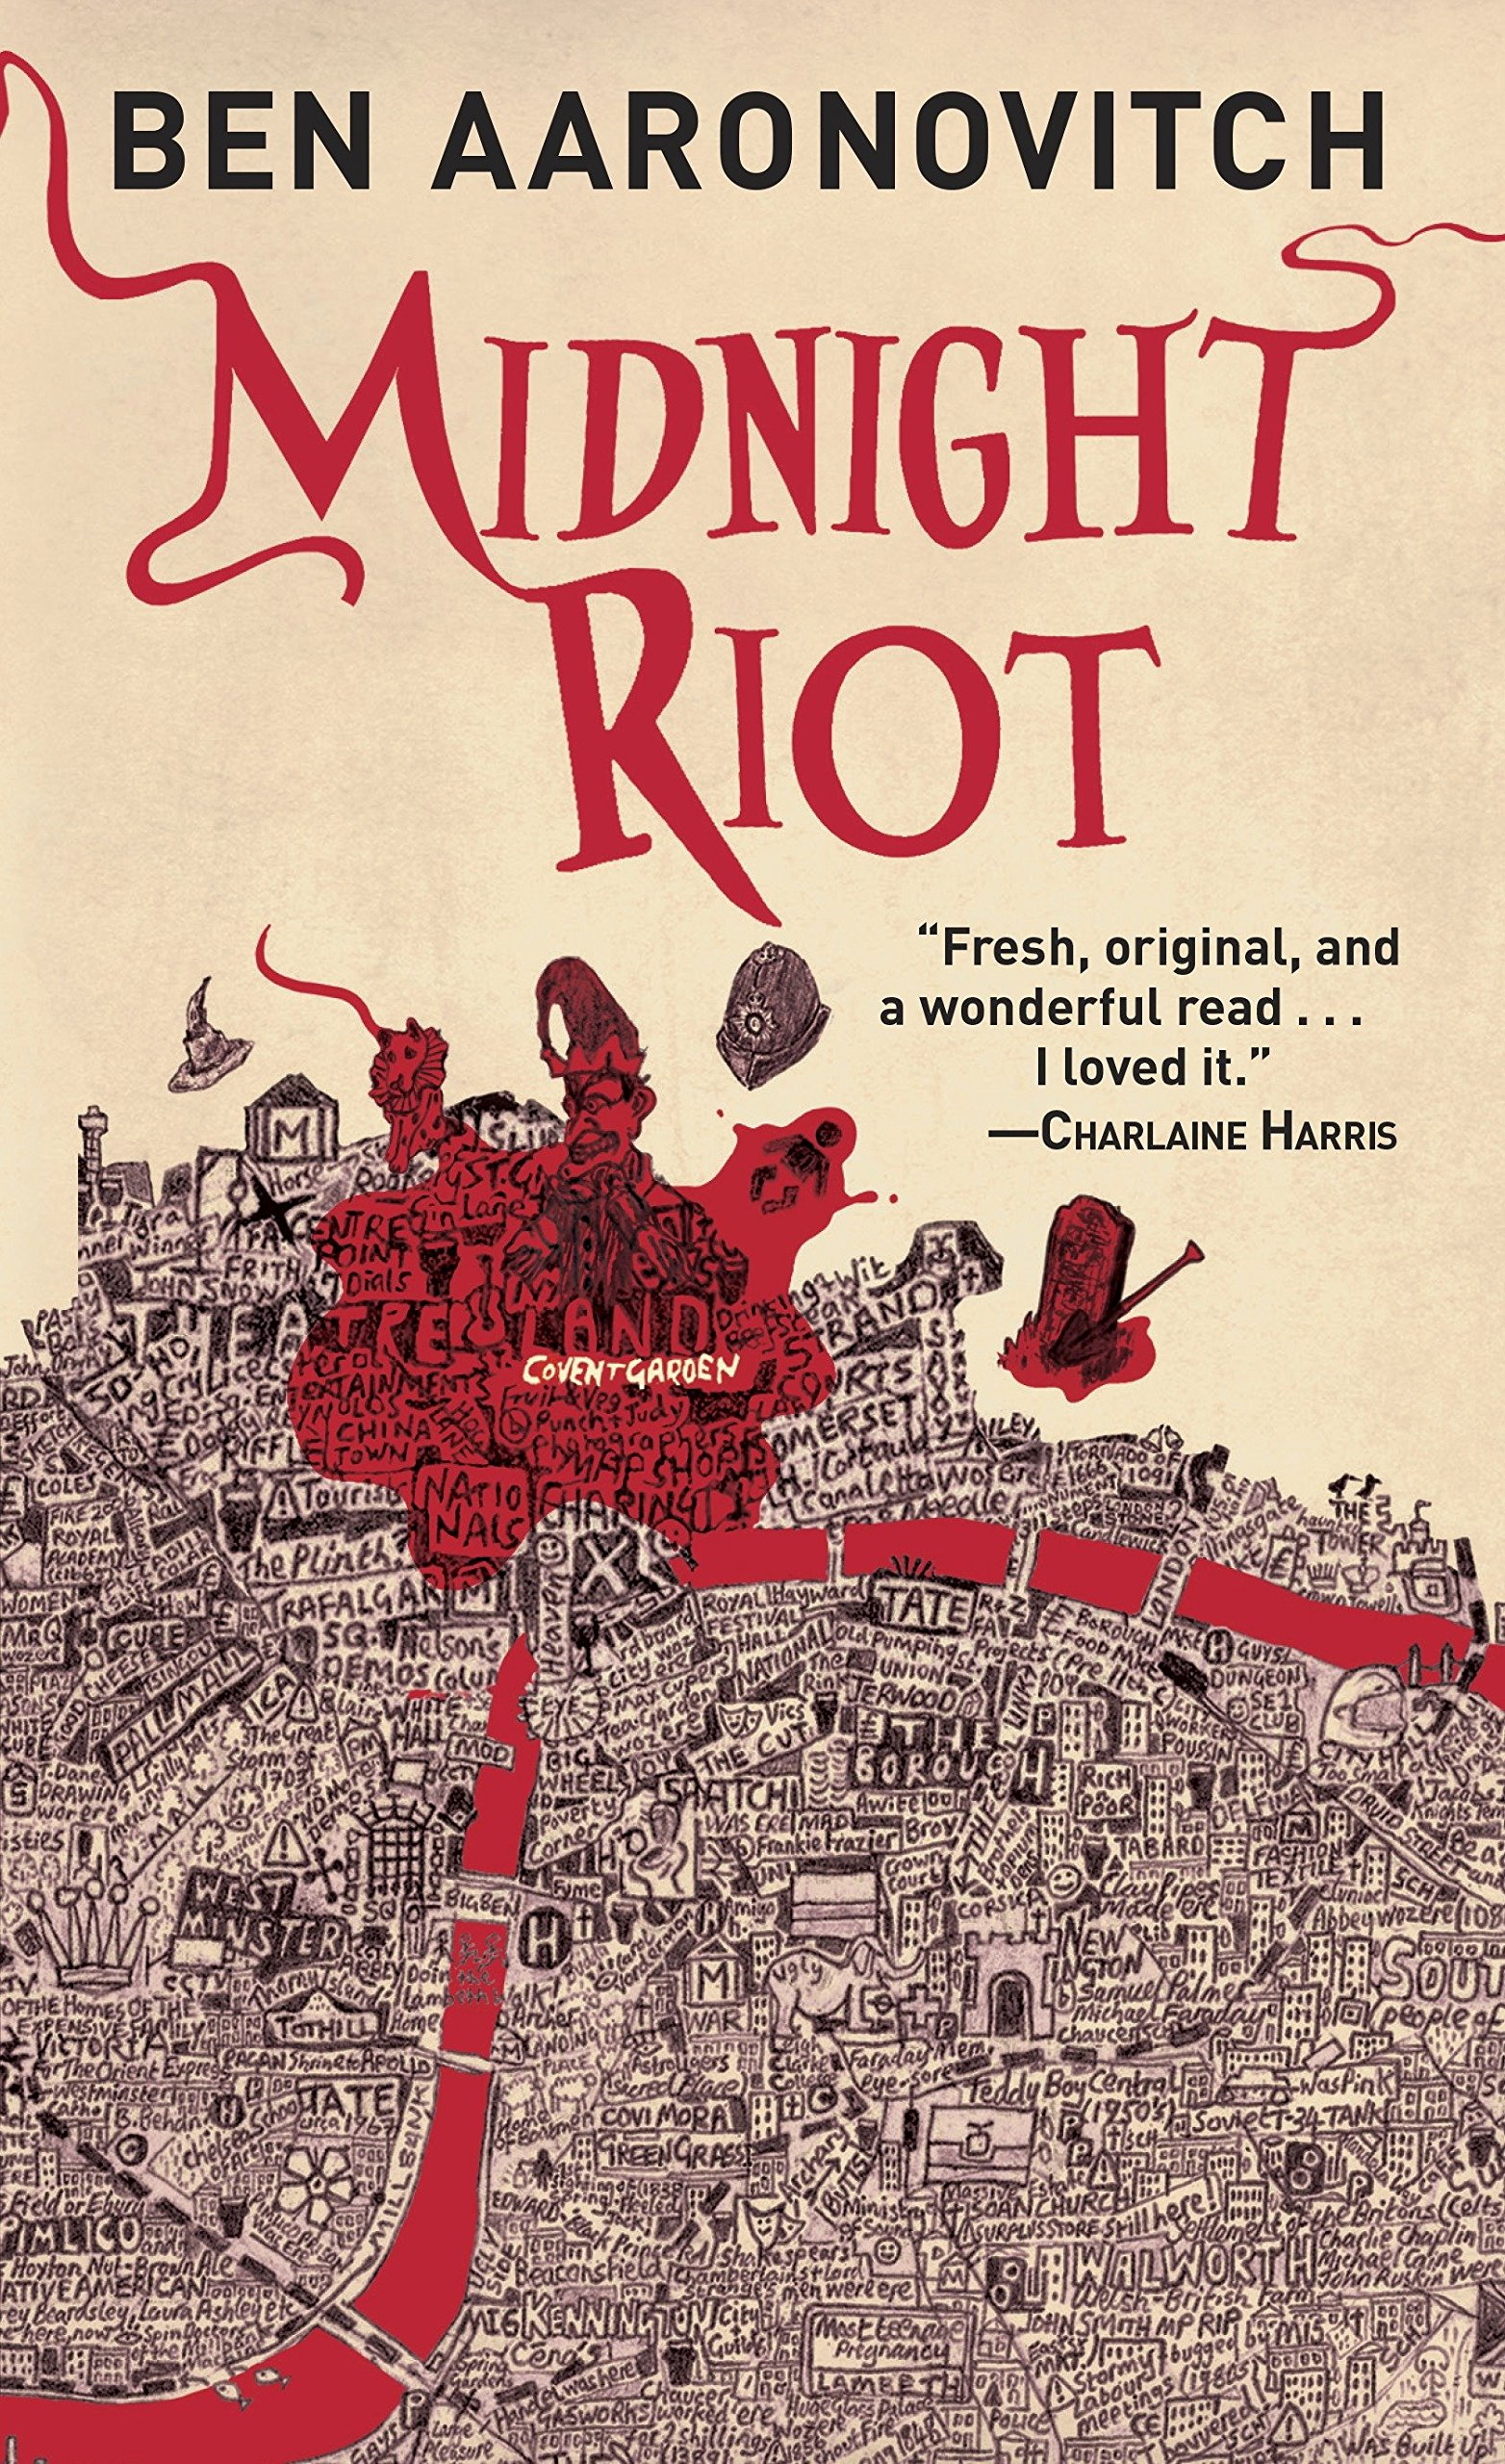 midnight riot by Ben Aaronovitch.jpg